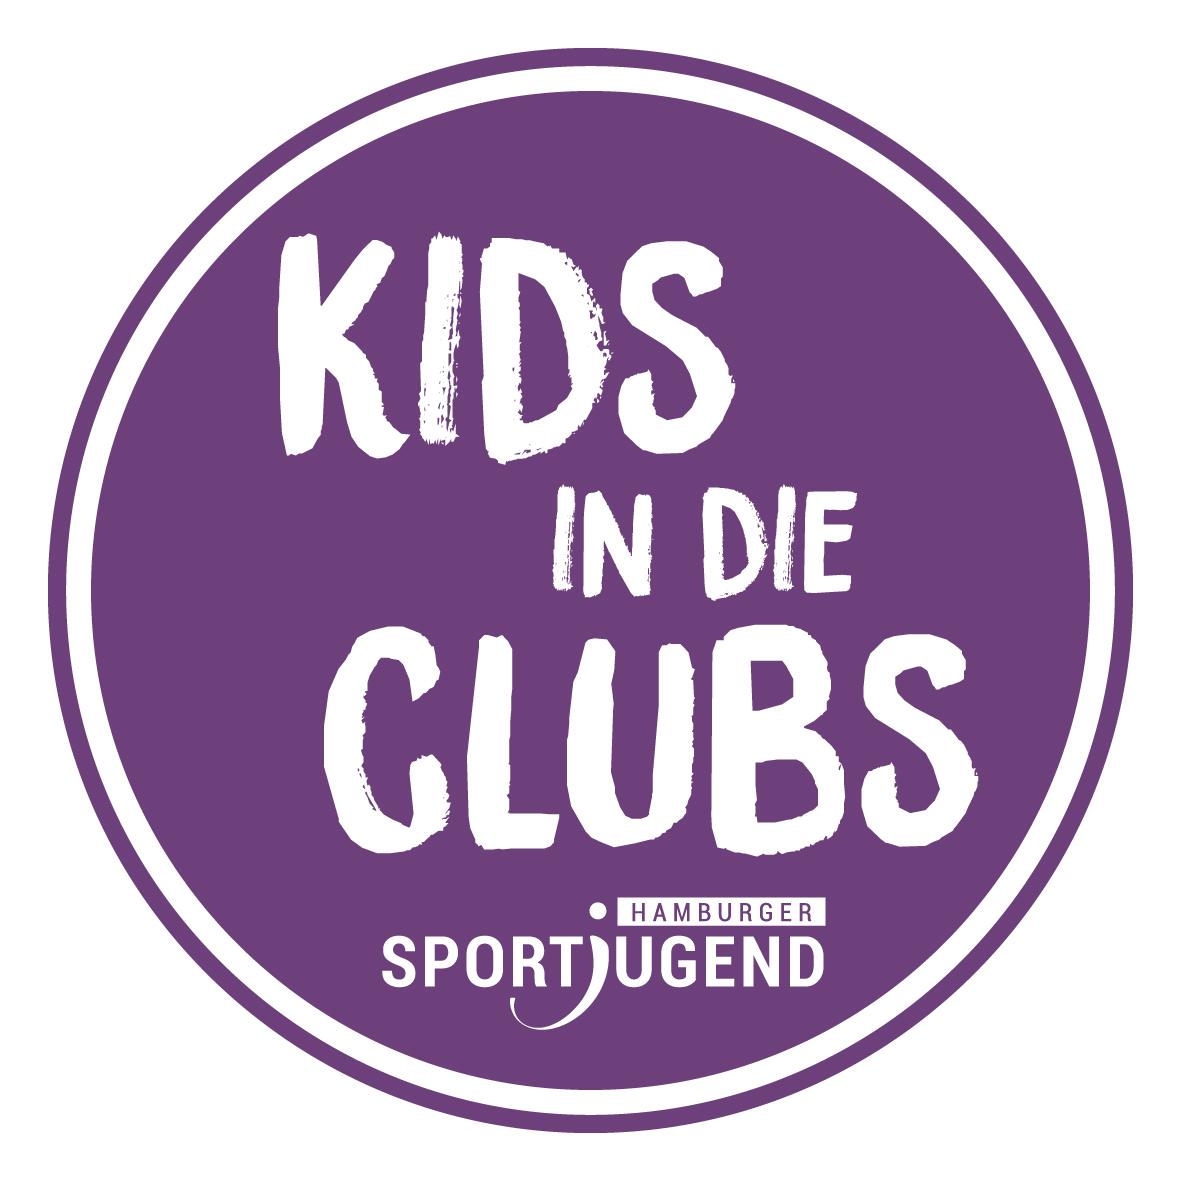 KIDC_Logo.jpg